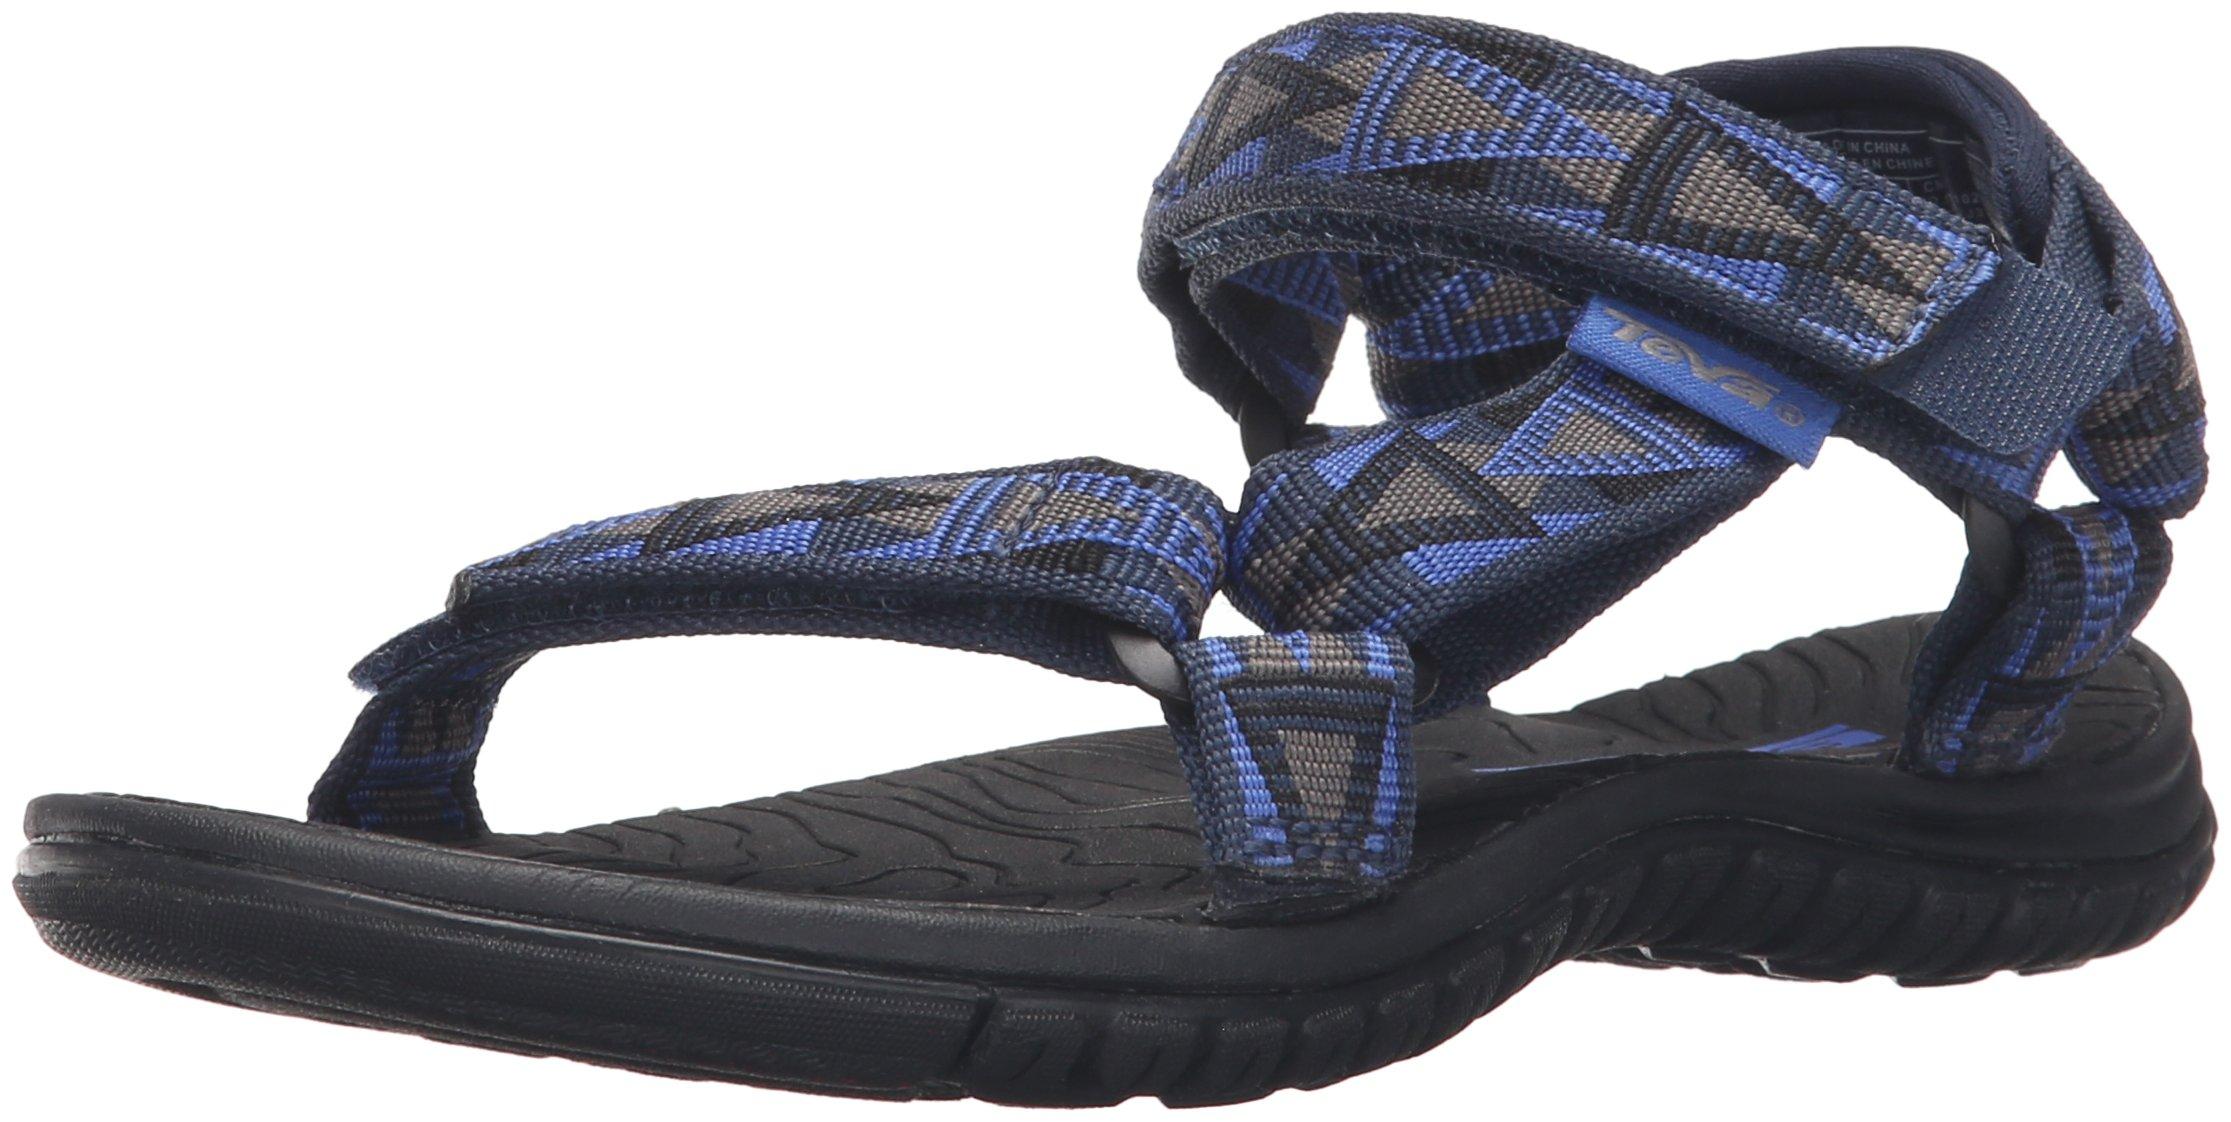 Teva Boys' Hurricane 3 Sandal, Mosaic Blue/Grey, 11 M US Little Kid